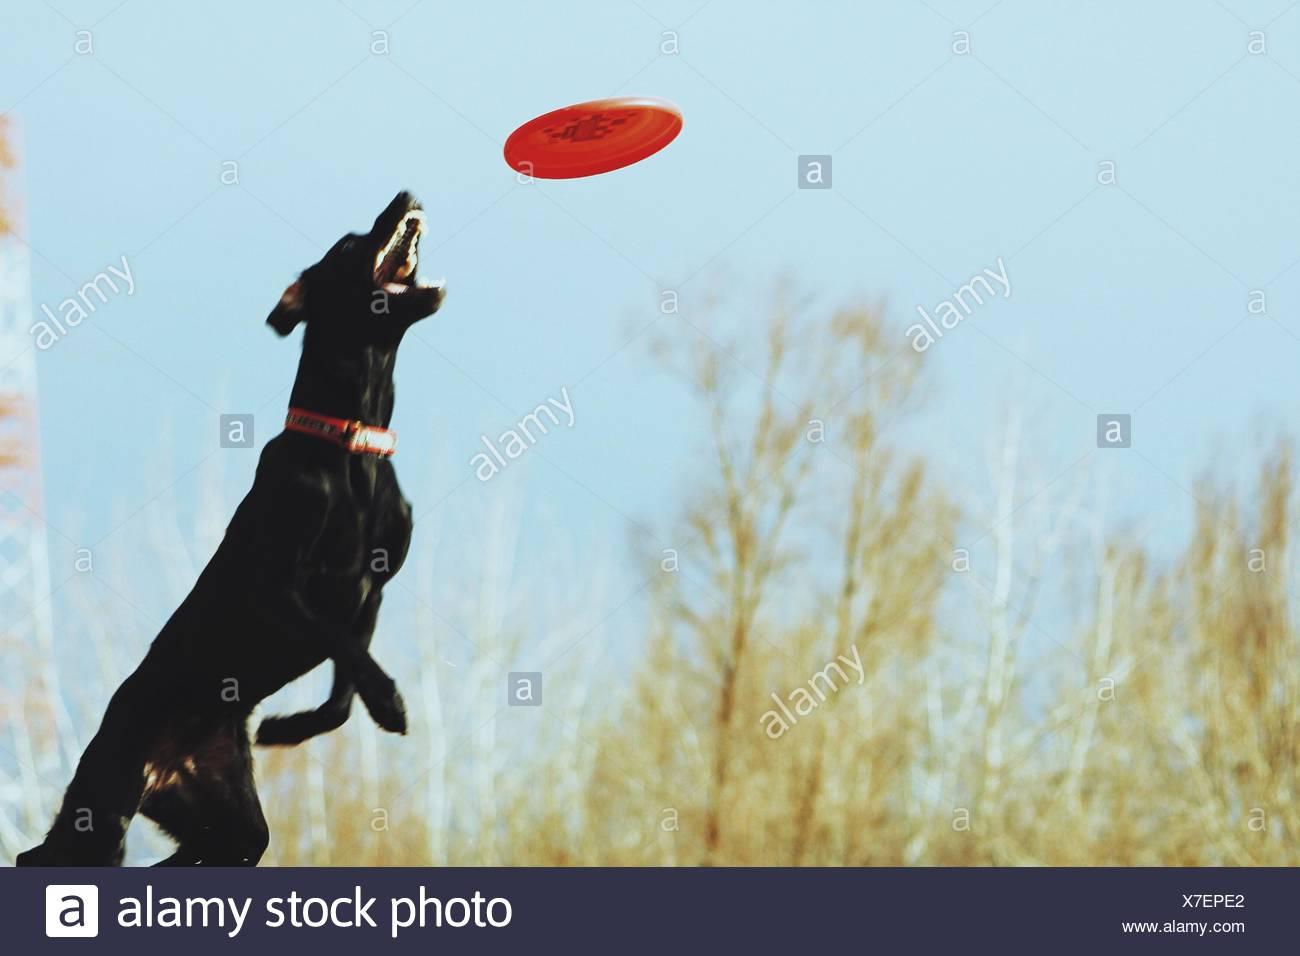 Doberman Pinscher Catching Plastic Disc - Stock Image